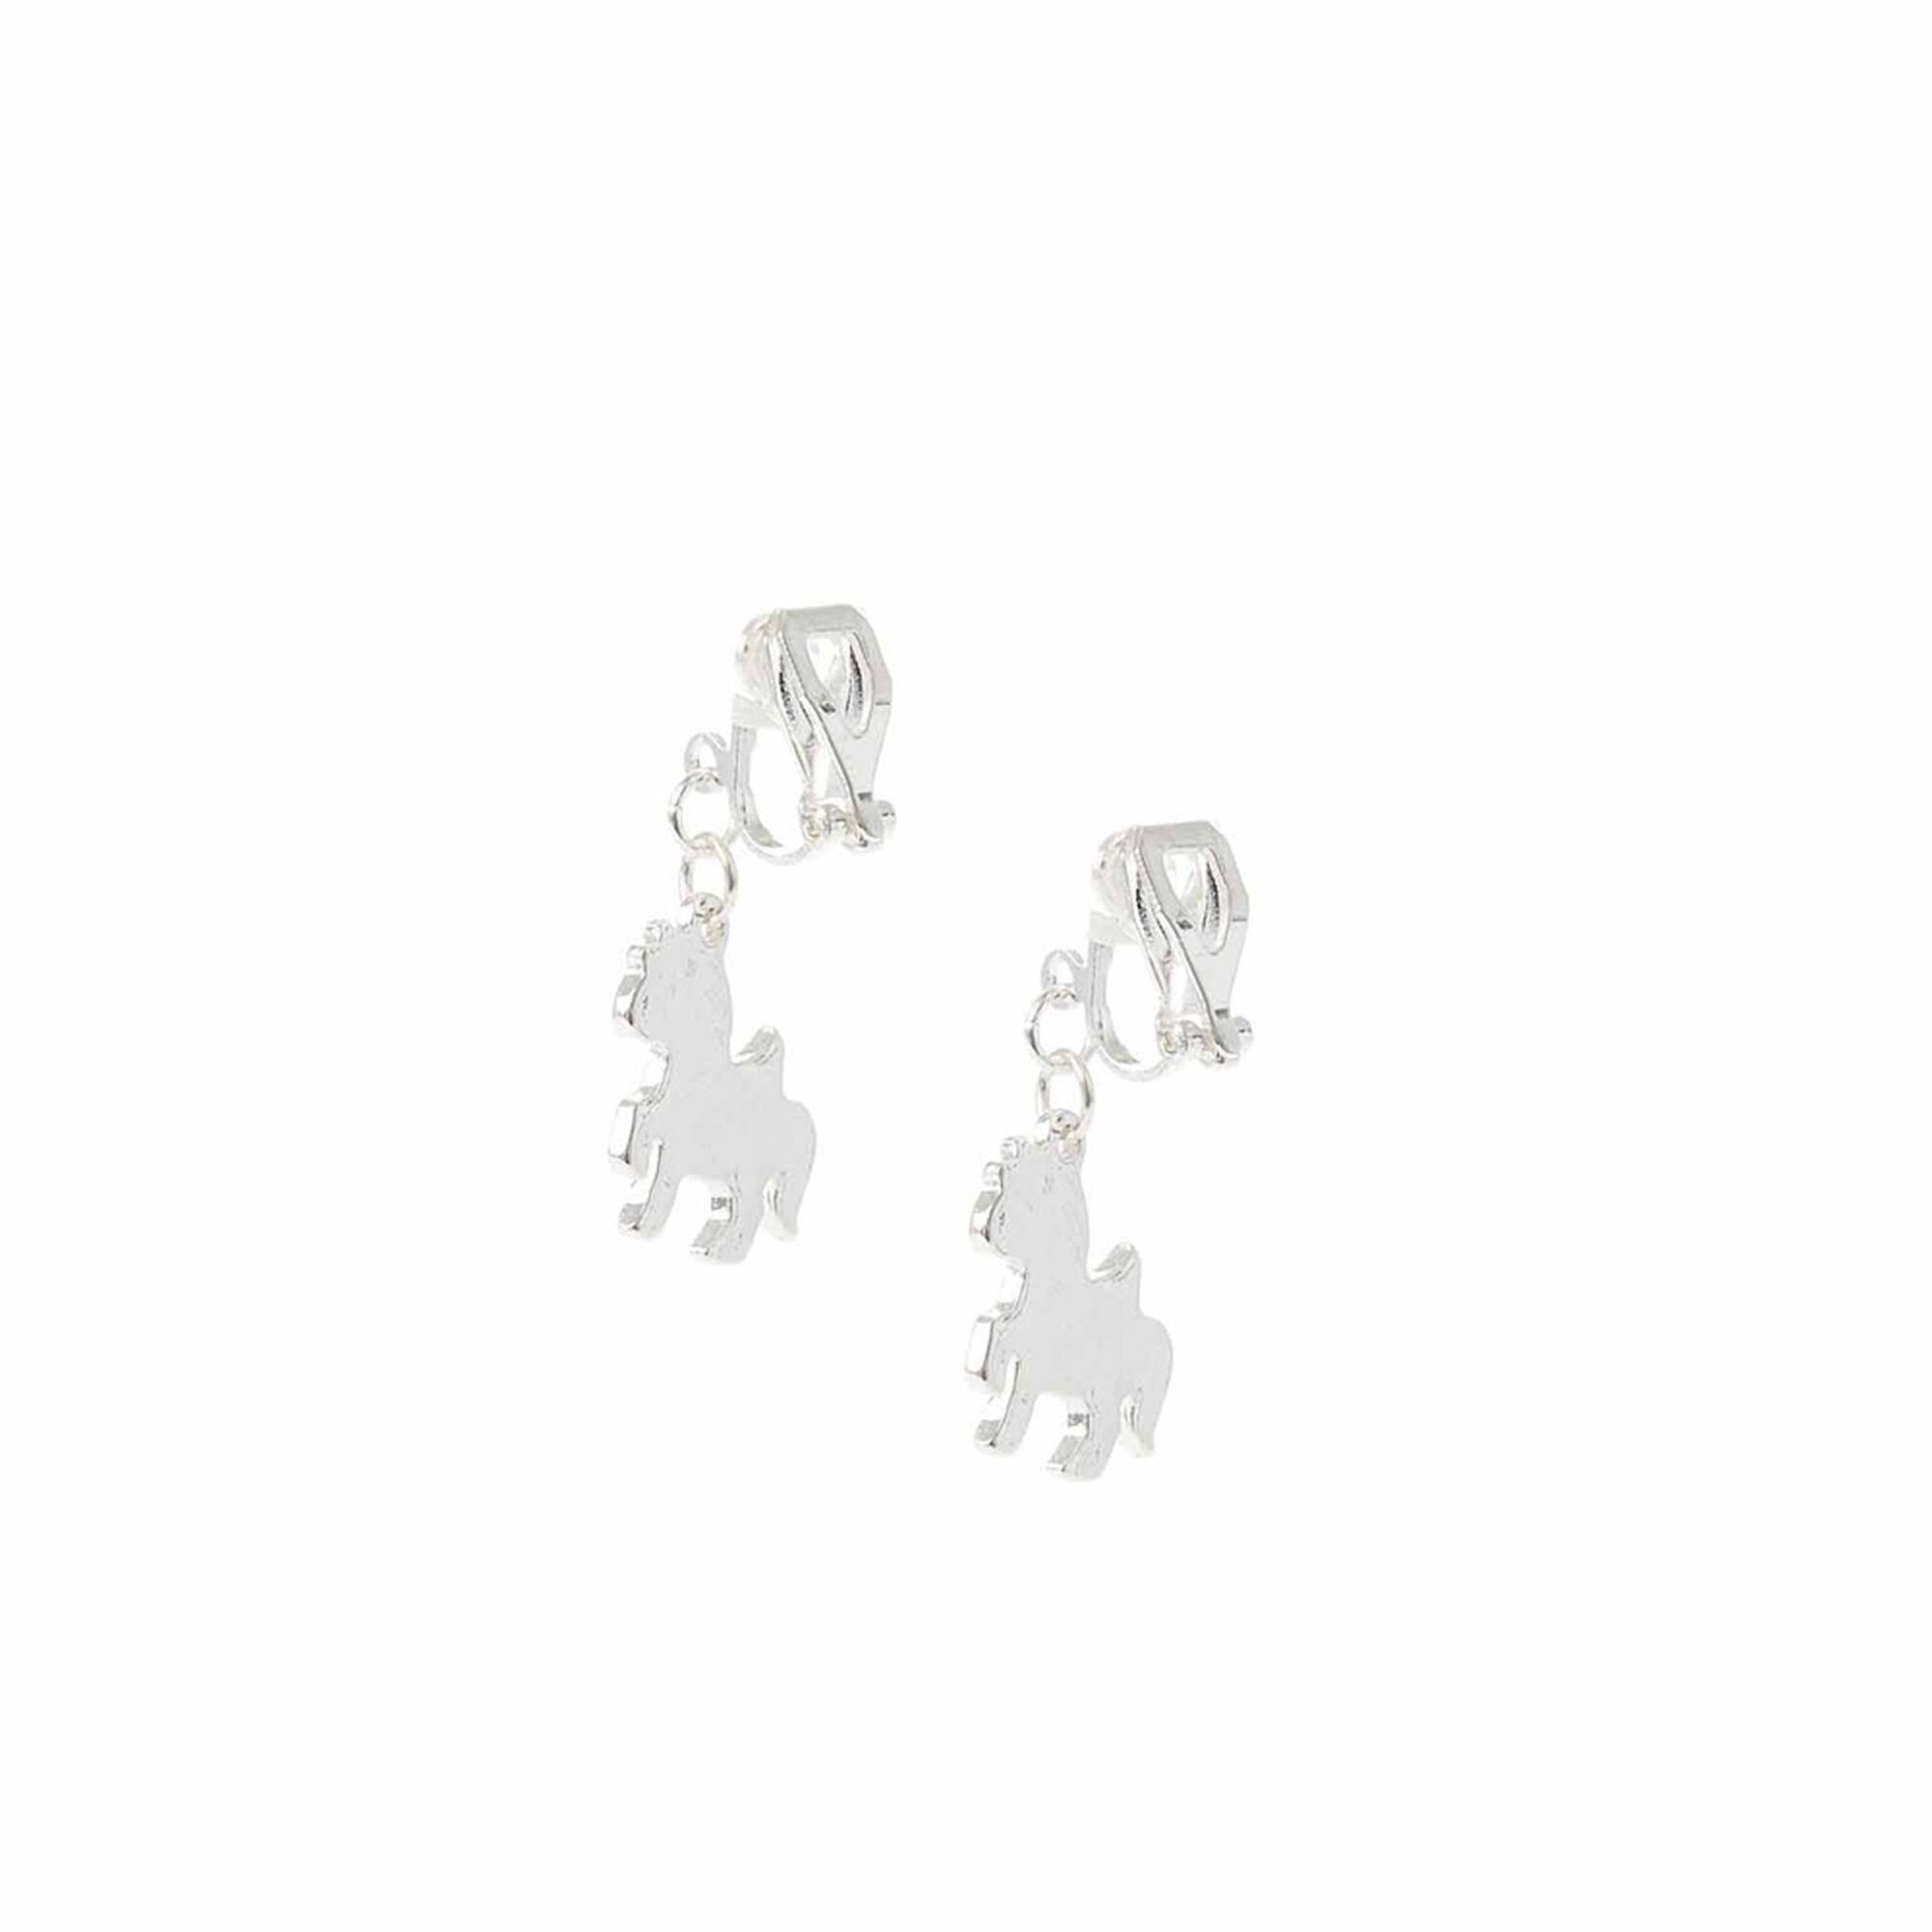 Magical Unicorn Clip On Earrings,